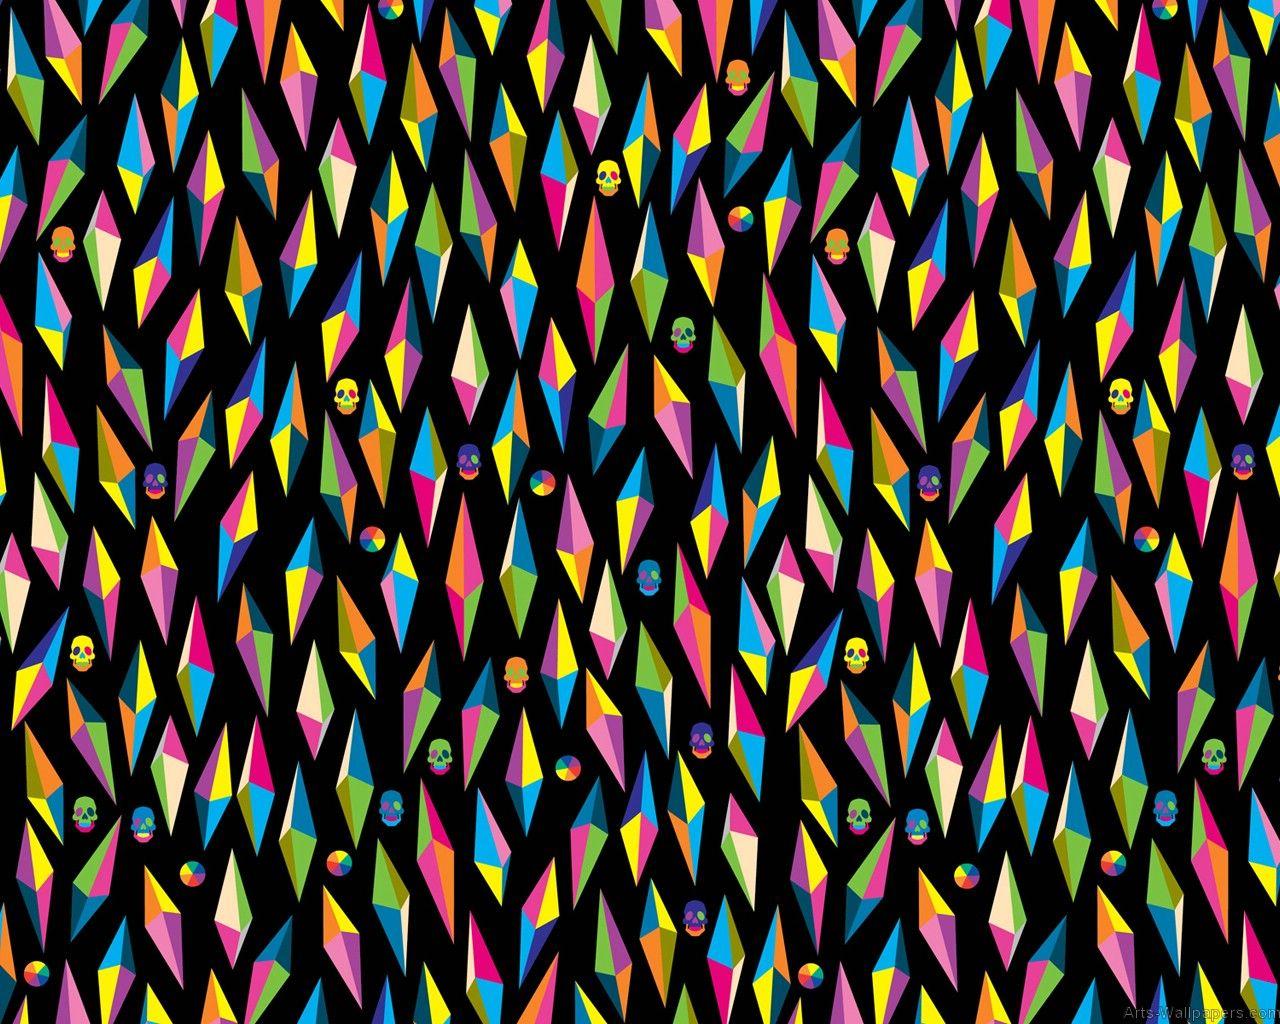 graphic art Amazing Beautiful 3d Graphic Art Wildscreen